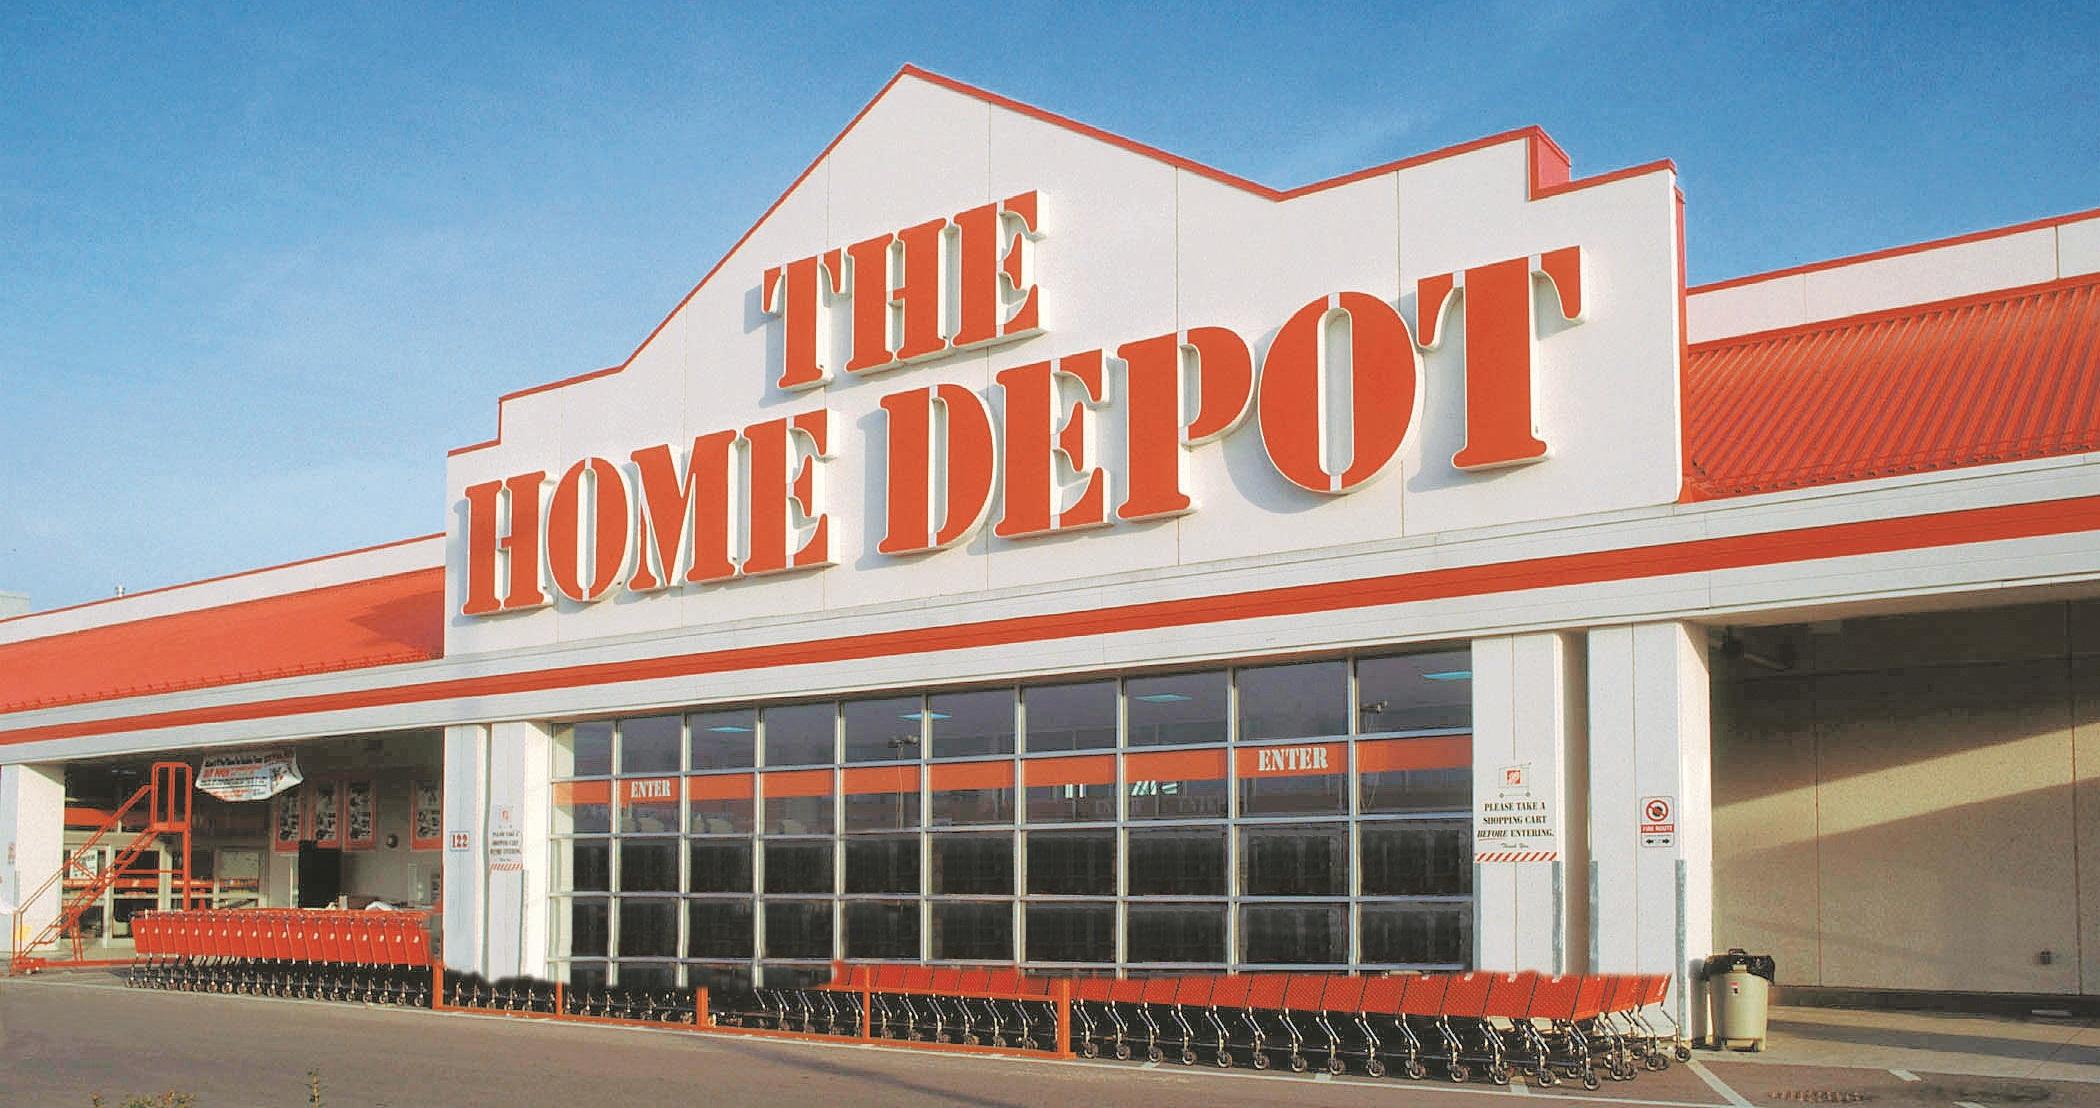 payment depot photo - 1